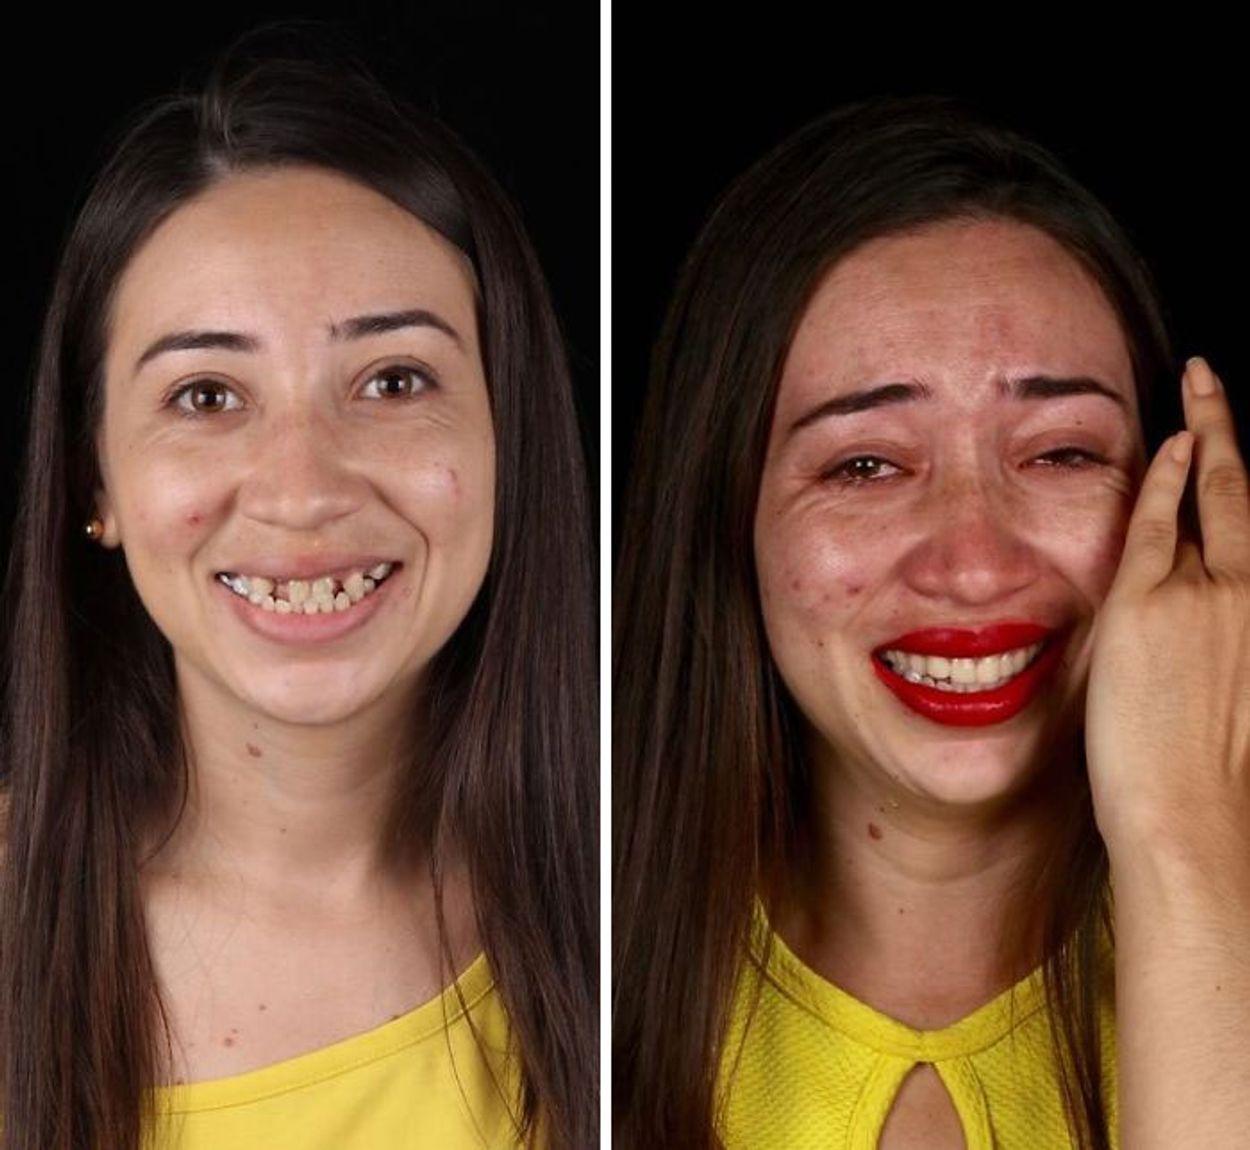 brazilian-dentist-travel-poor-people-teeth-fix-felipe-rossi-32-5db94f6e9ec9f__700